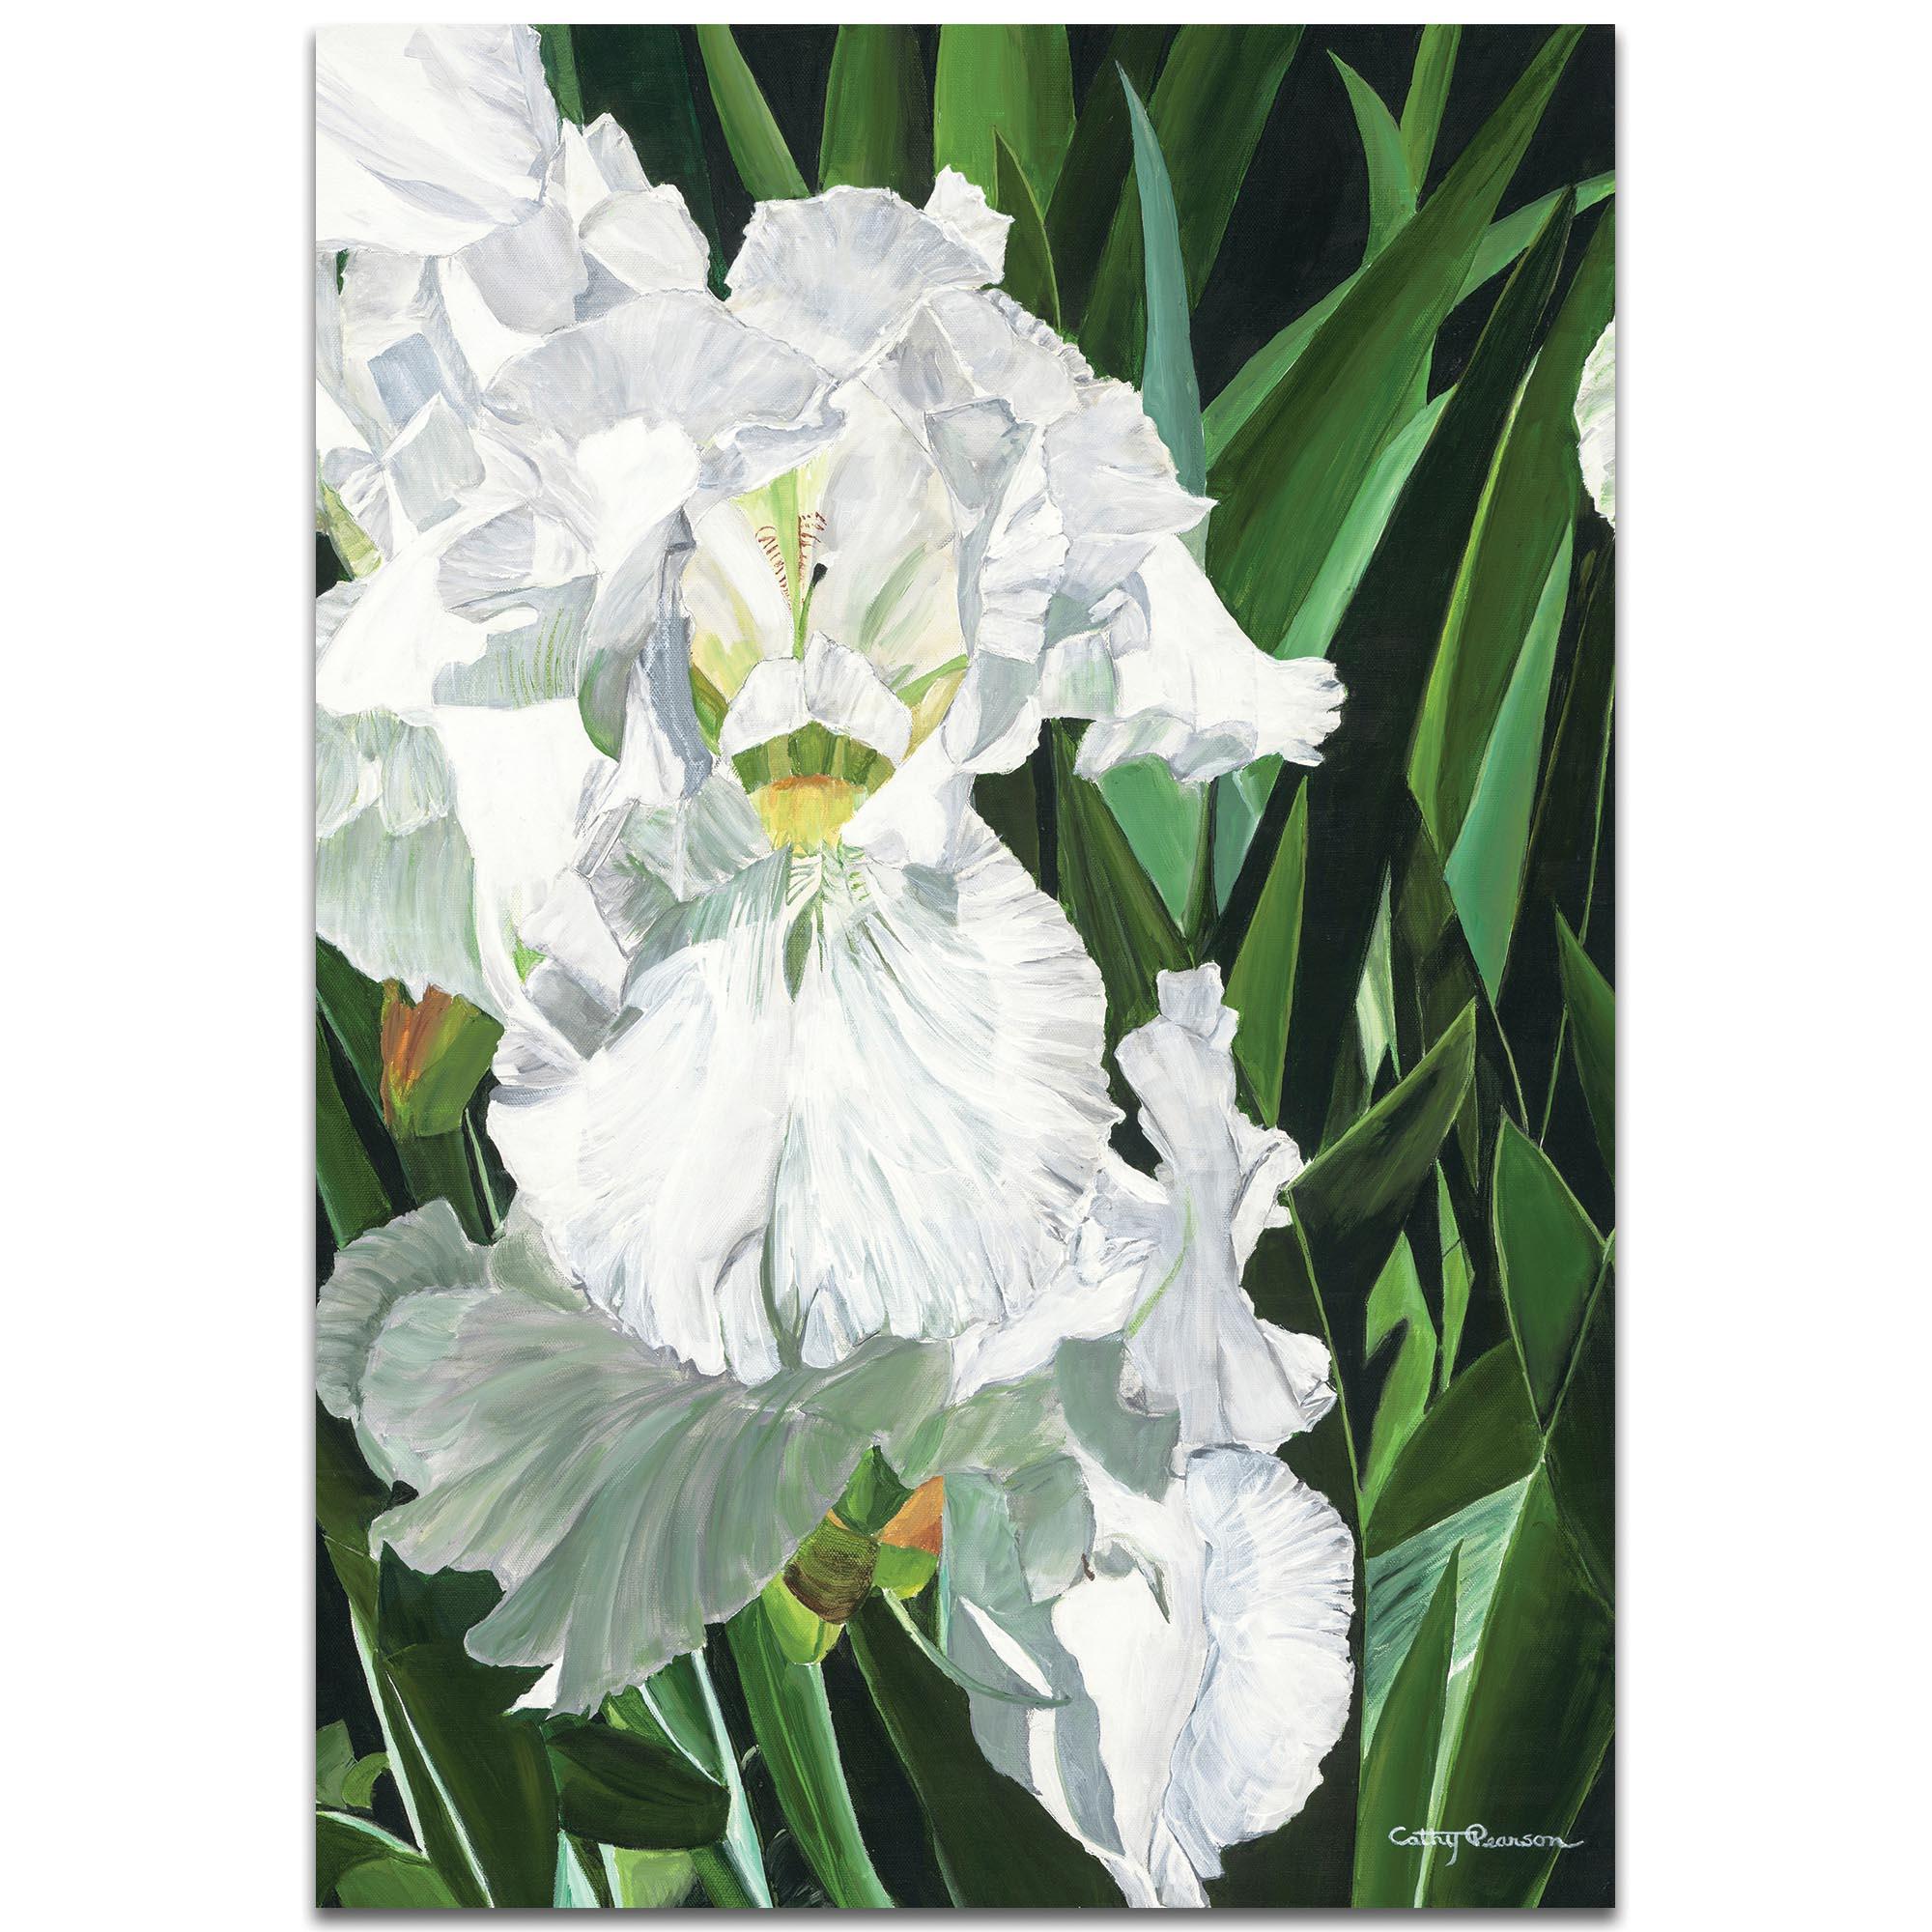 Traditional Wall Art 'Helens Iris' - Floral Decor on Metal or Plexiglass